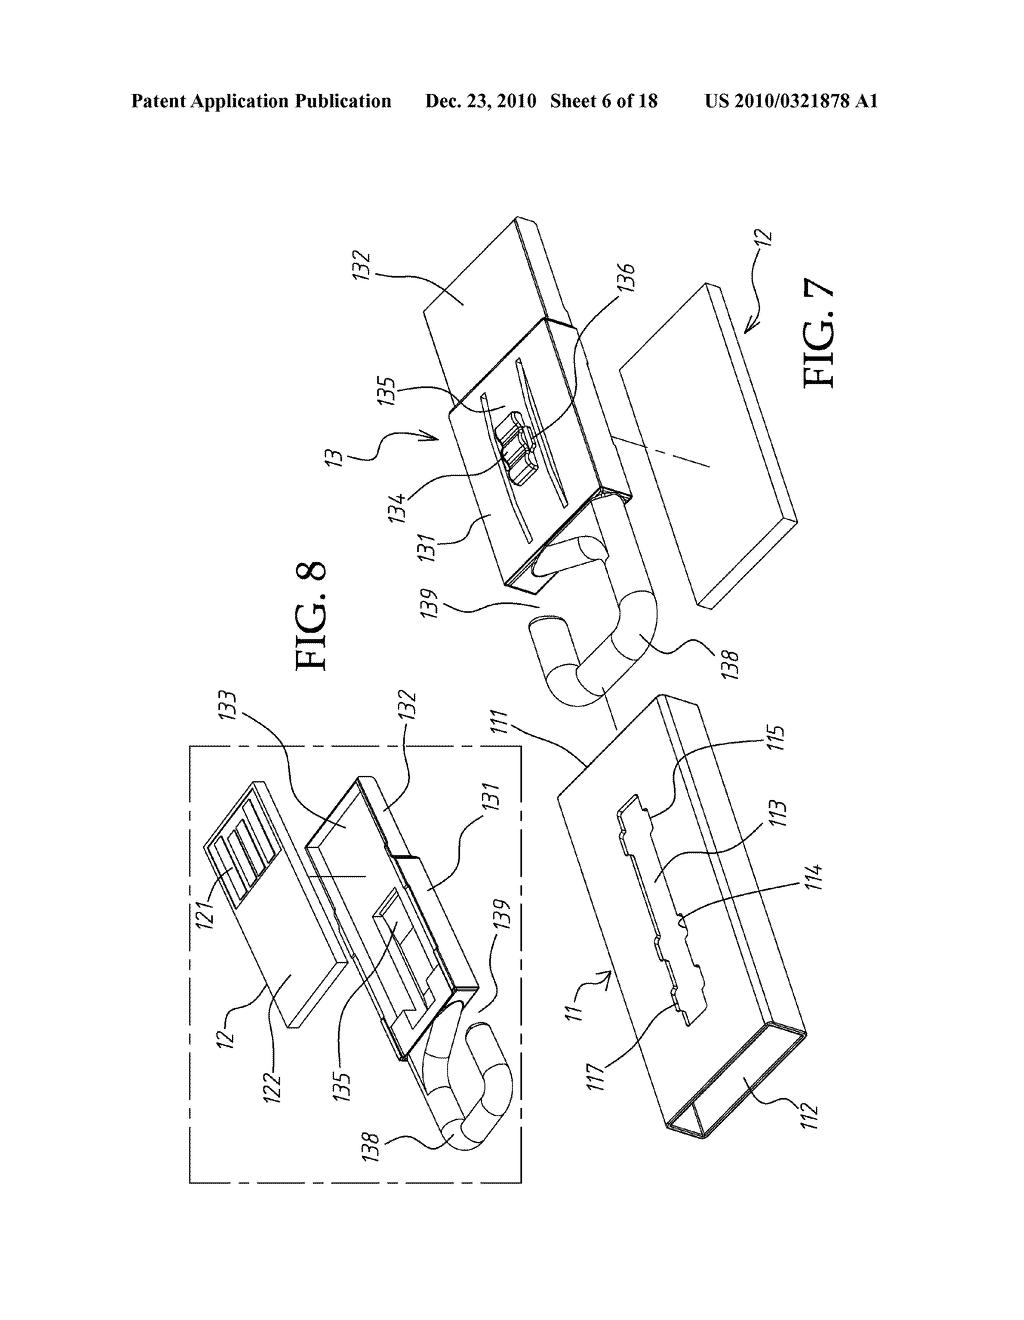 Usb Memory Stick Diagram Schematic Electrical Drawing Wiring Front Schematics Diagrams U2022 Rh Seniorlivinguniversity Co Serial To